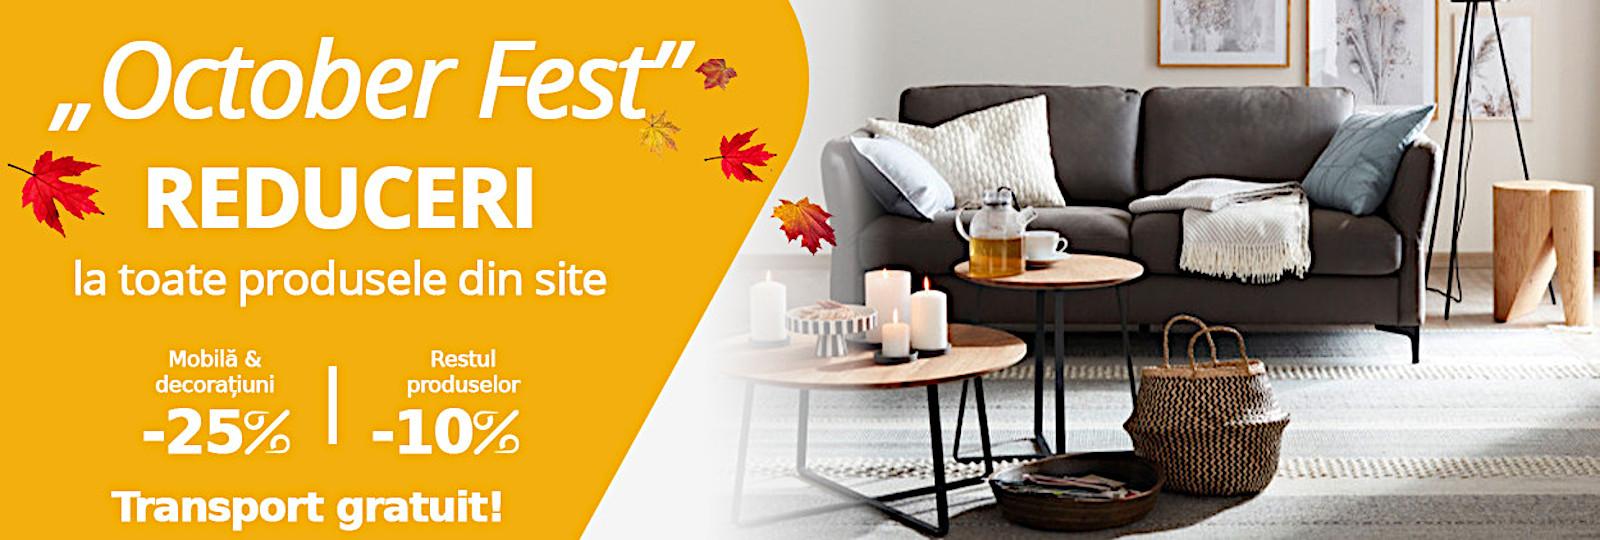 October Fest mobila decoratiuni de nepretuit